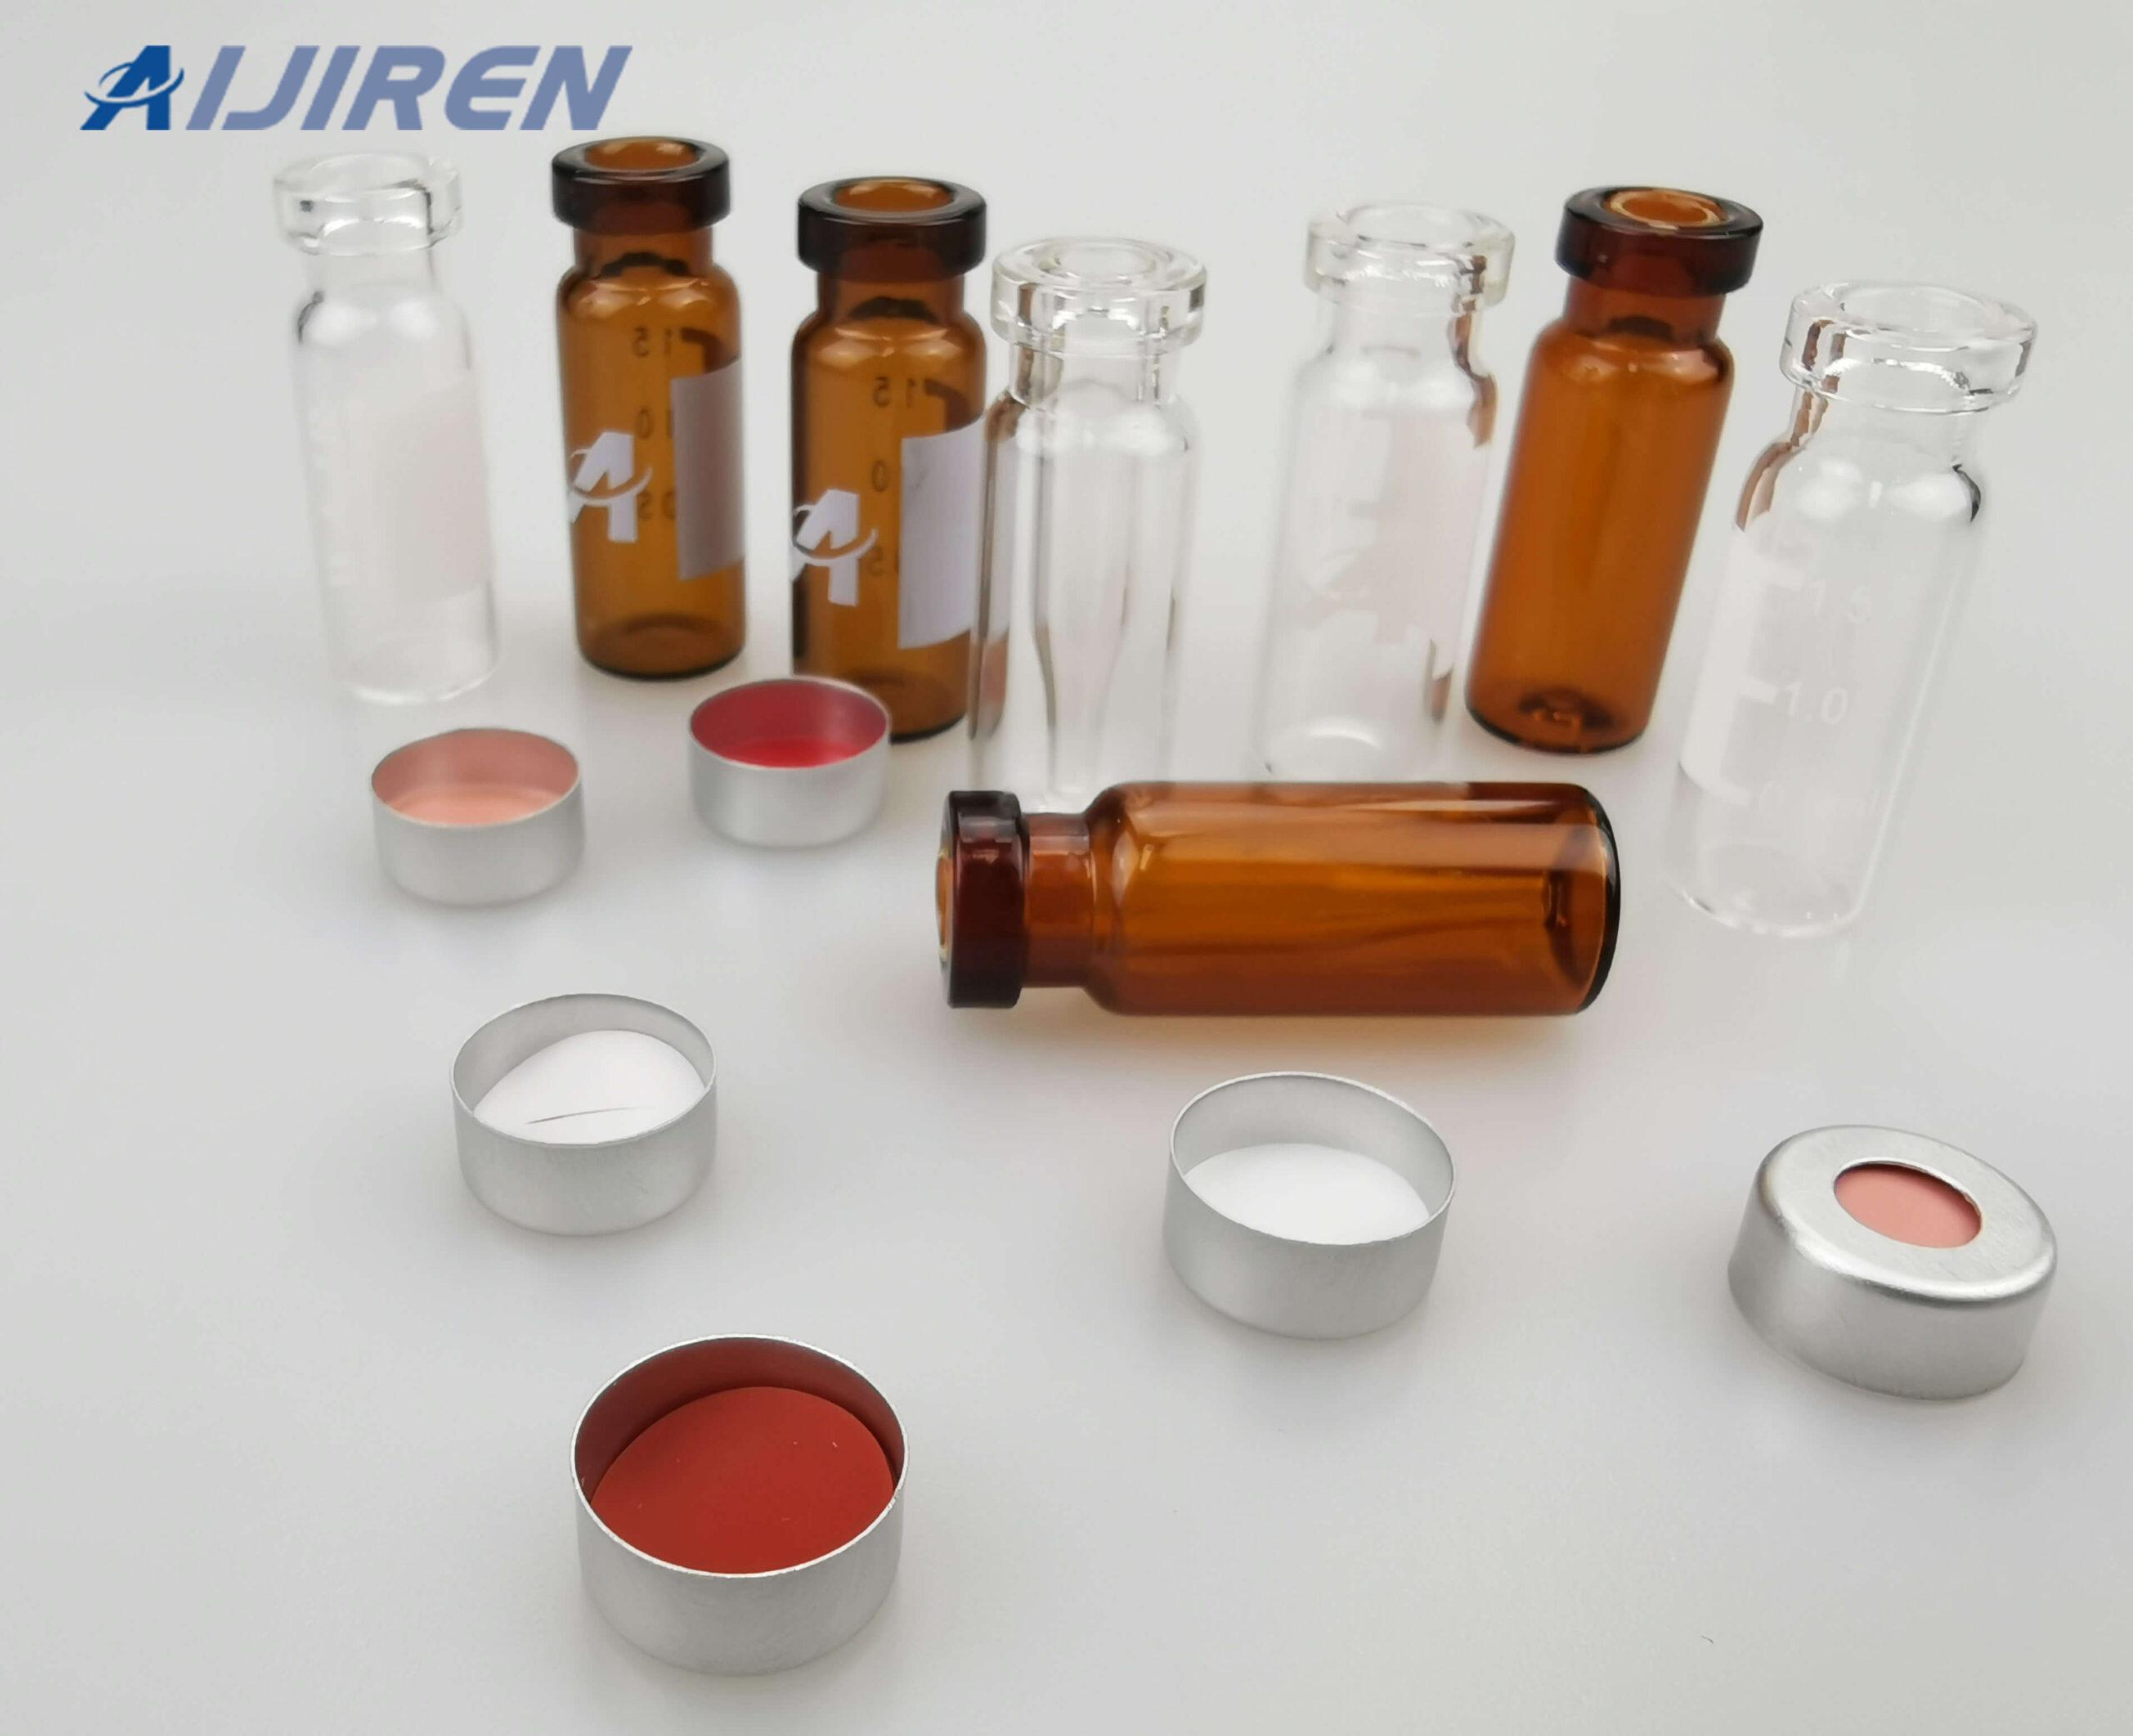 20ml headspace vial2ml Crimp Top Glass Vial on Sale